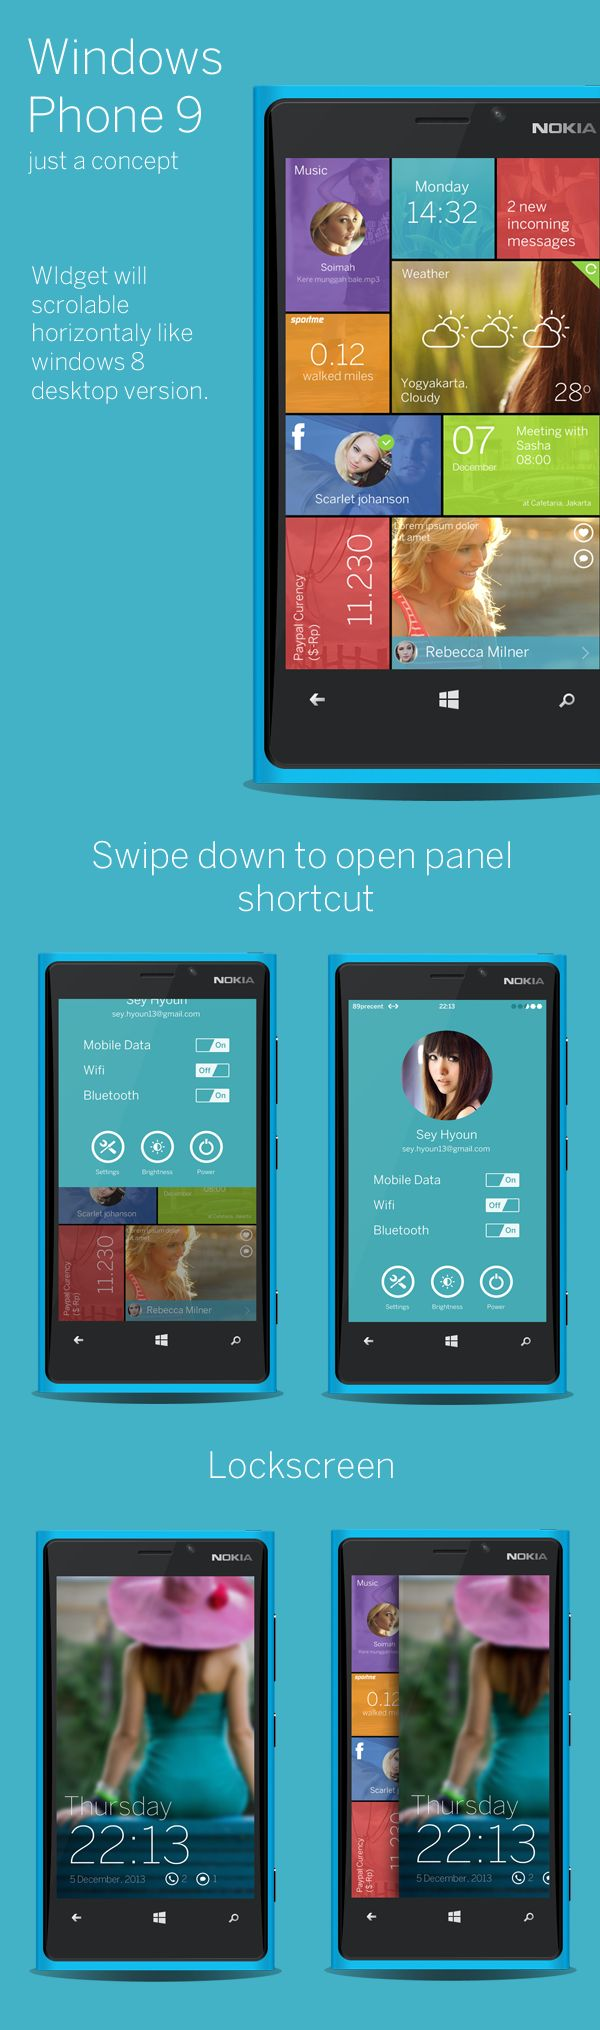 Windows Phone 9 concept on Behance